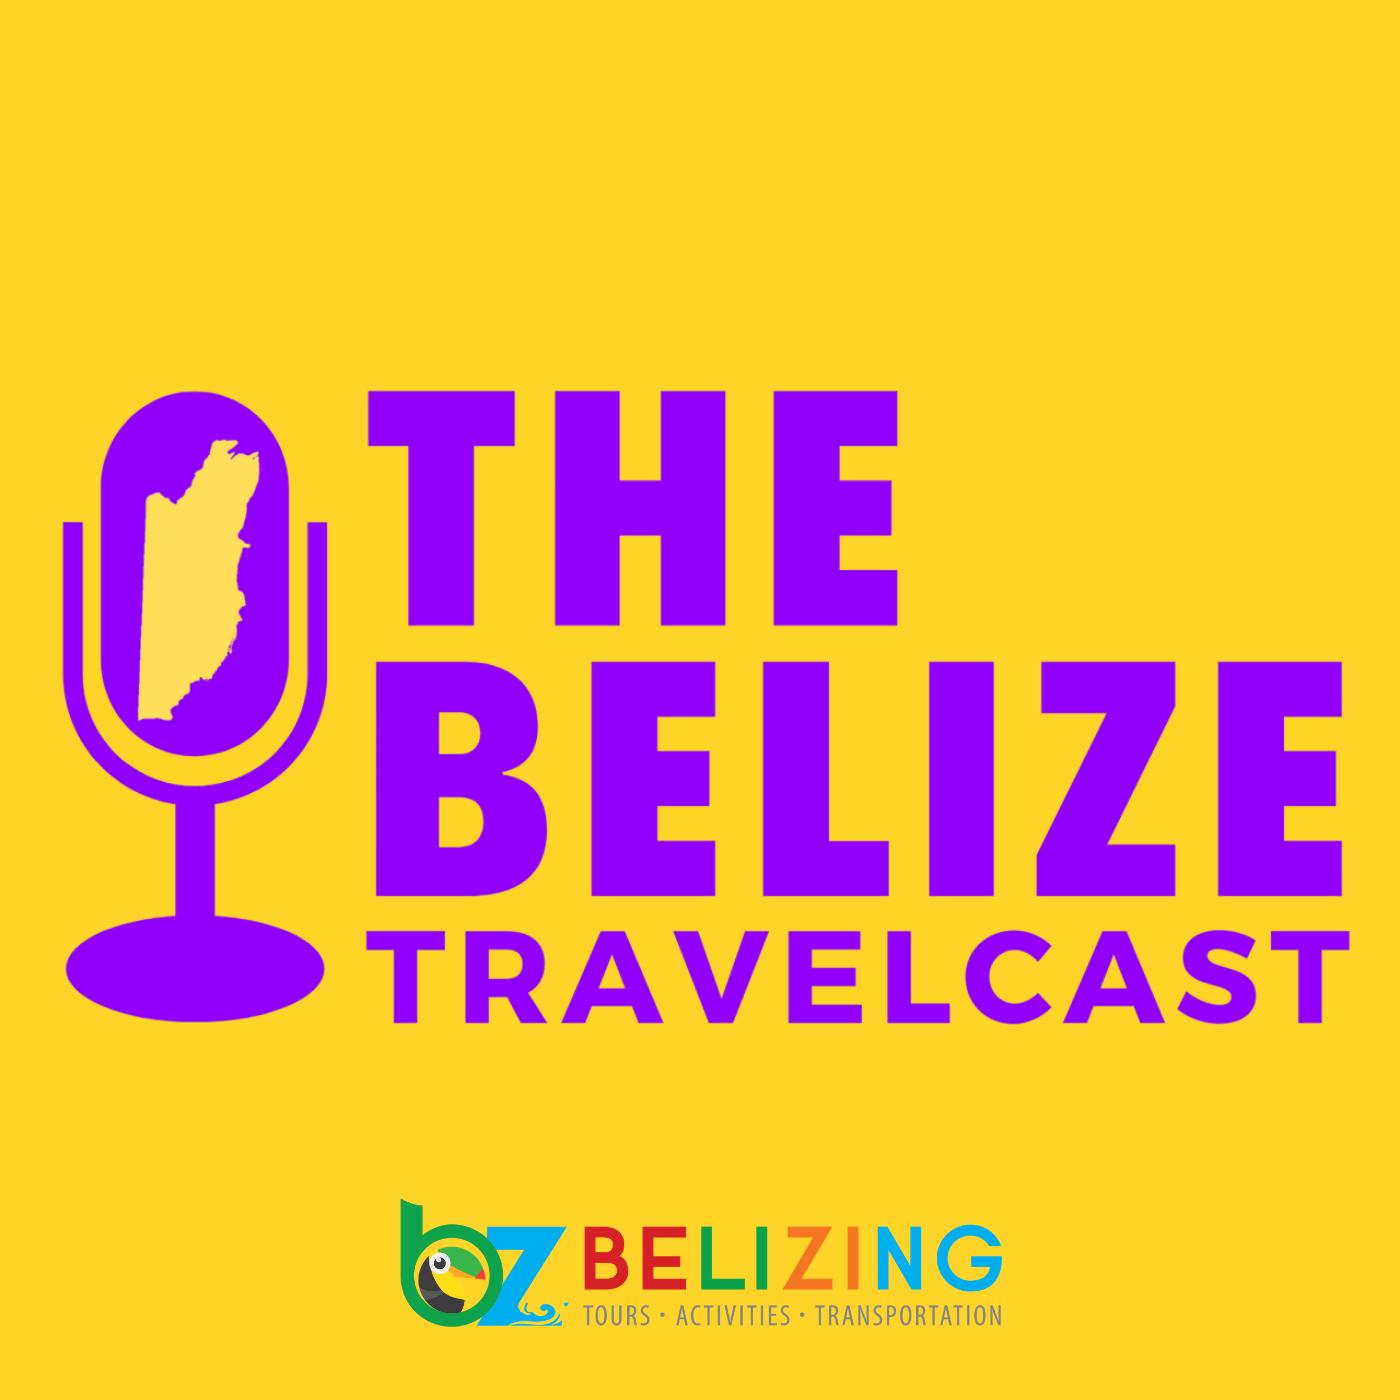 Belize Travelcast